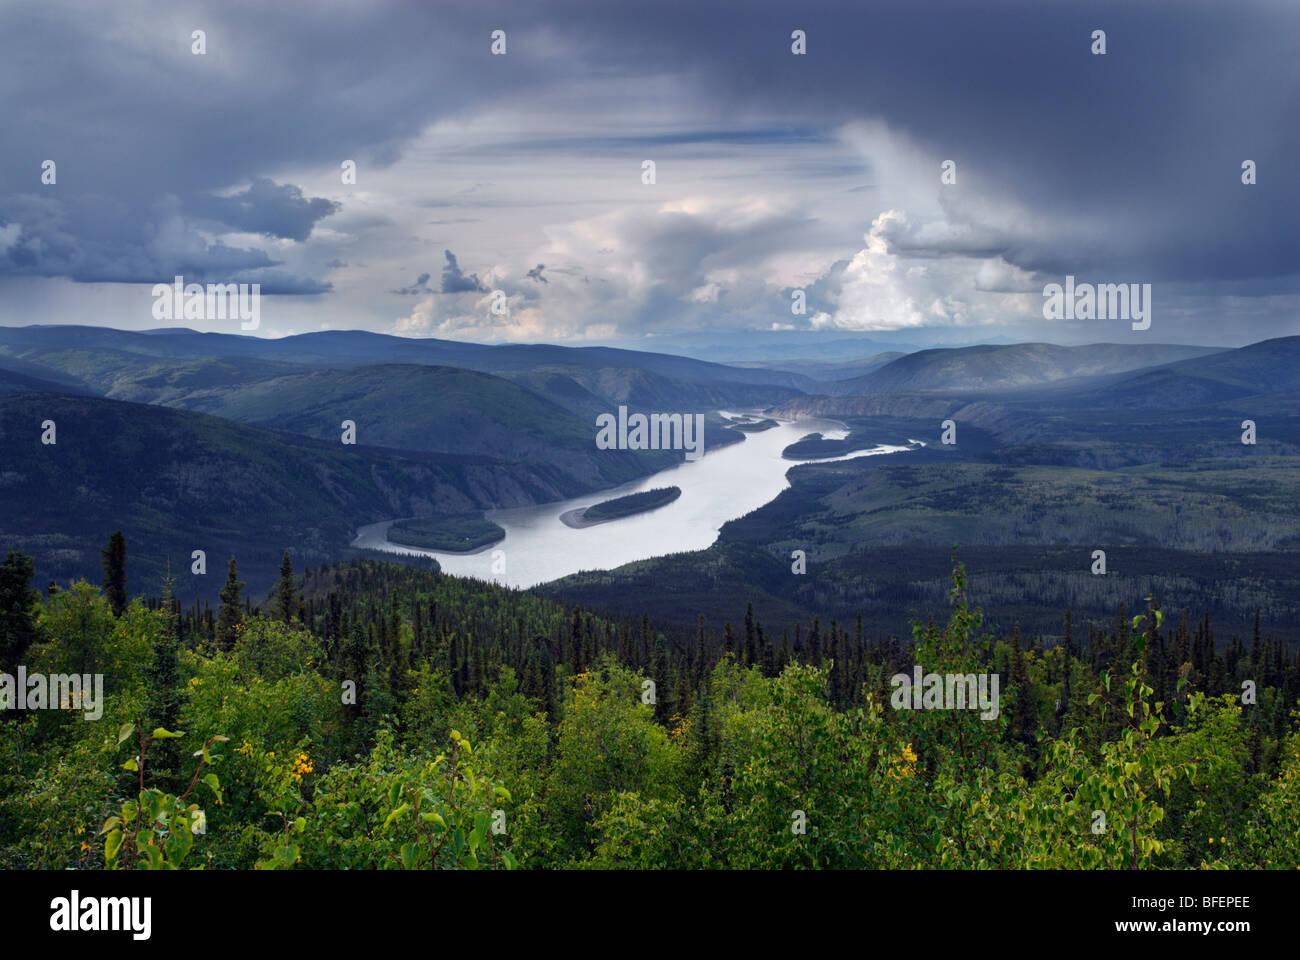 Klondike River, Dawson City, Yukon Territory, Canada - Stock Image